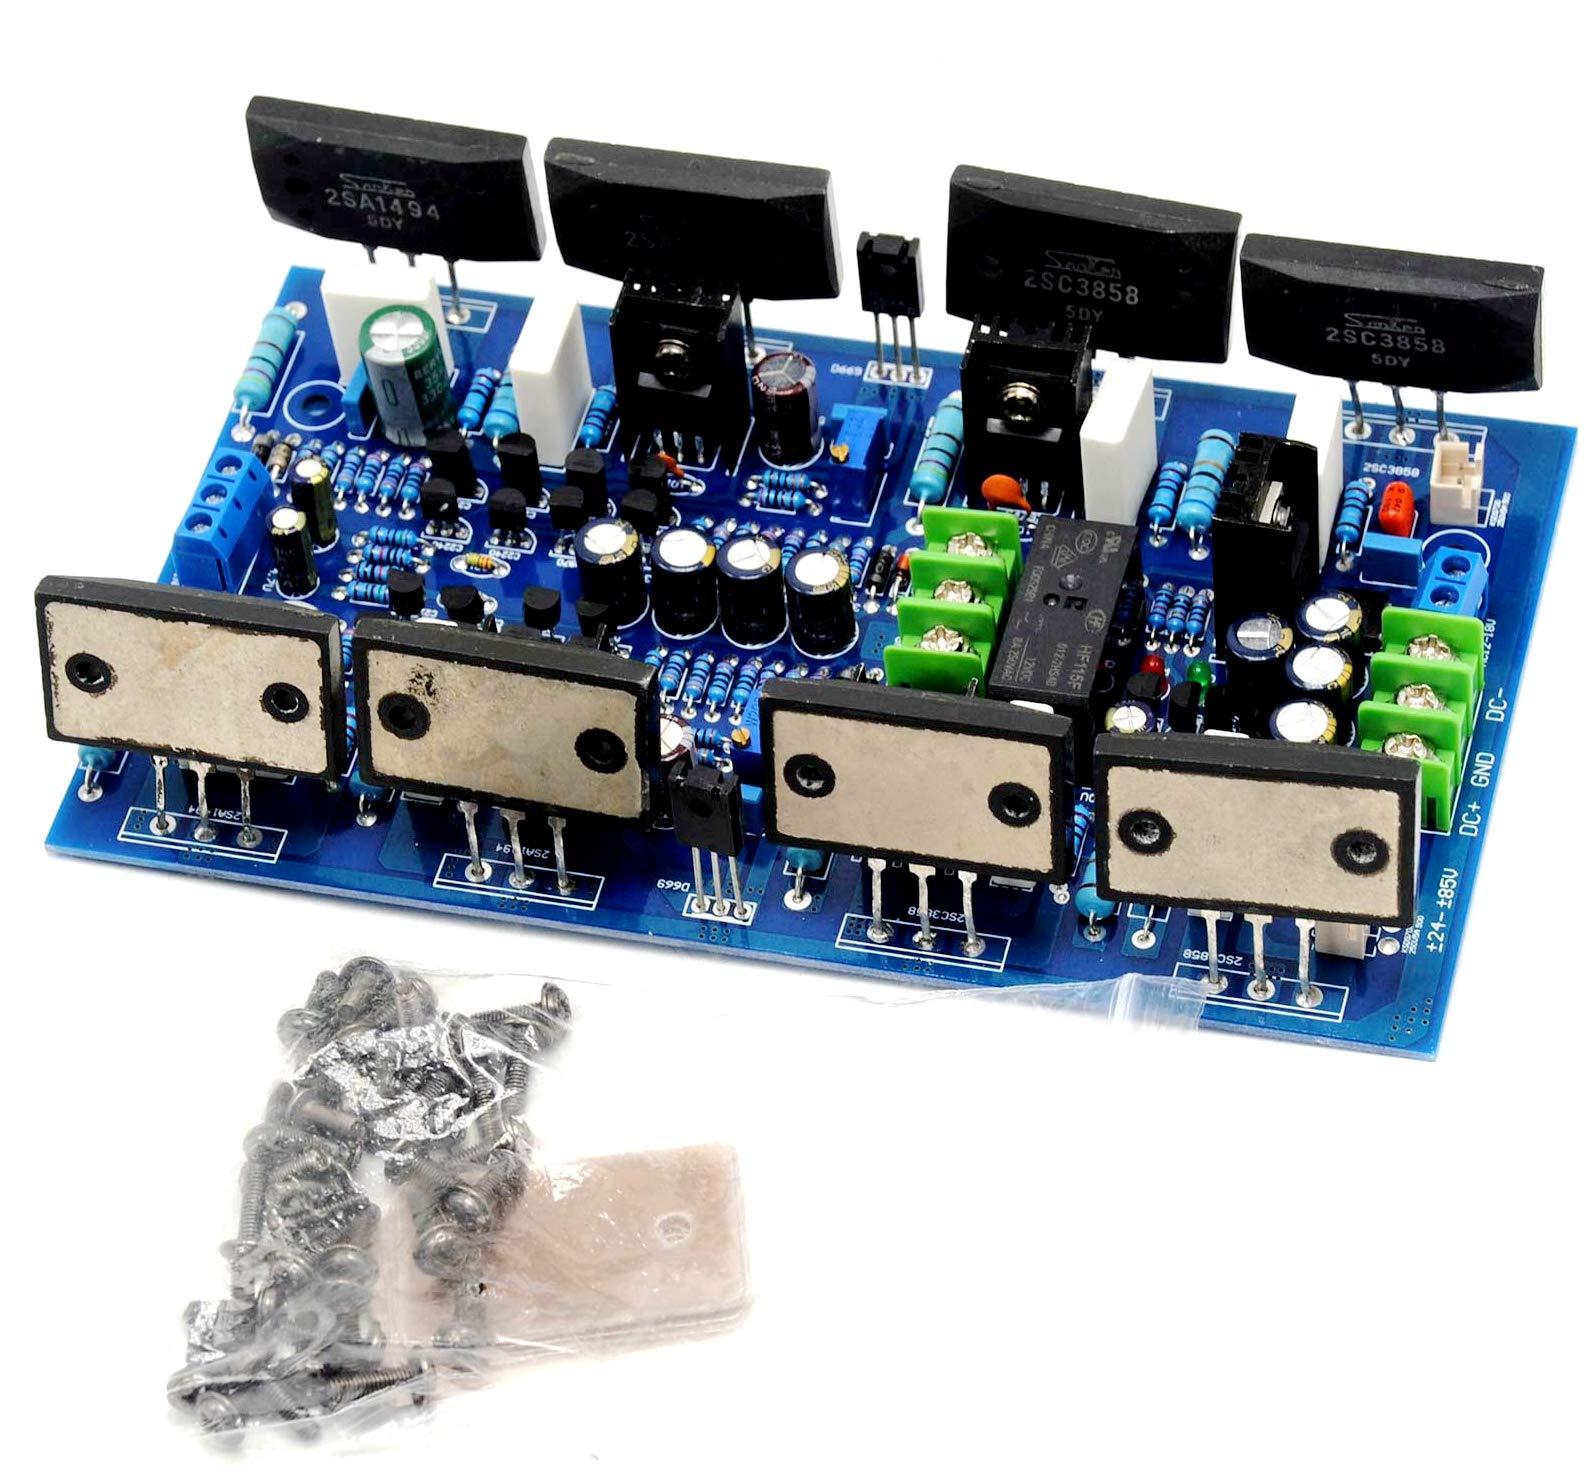 Dual 2SA1494 2SC3858 Stereo Amplifier Board 300w + 300w w/Speaker Protection